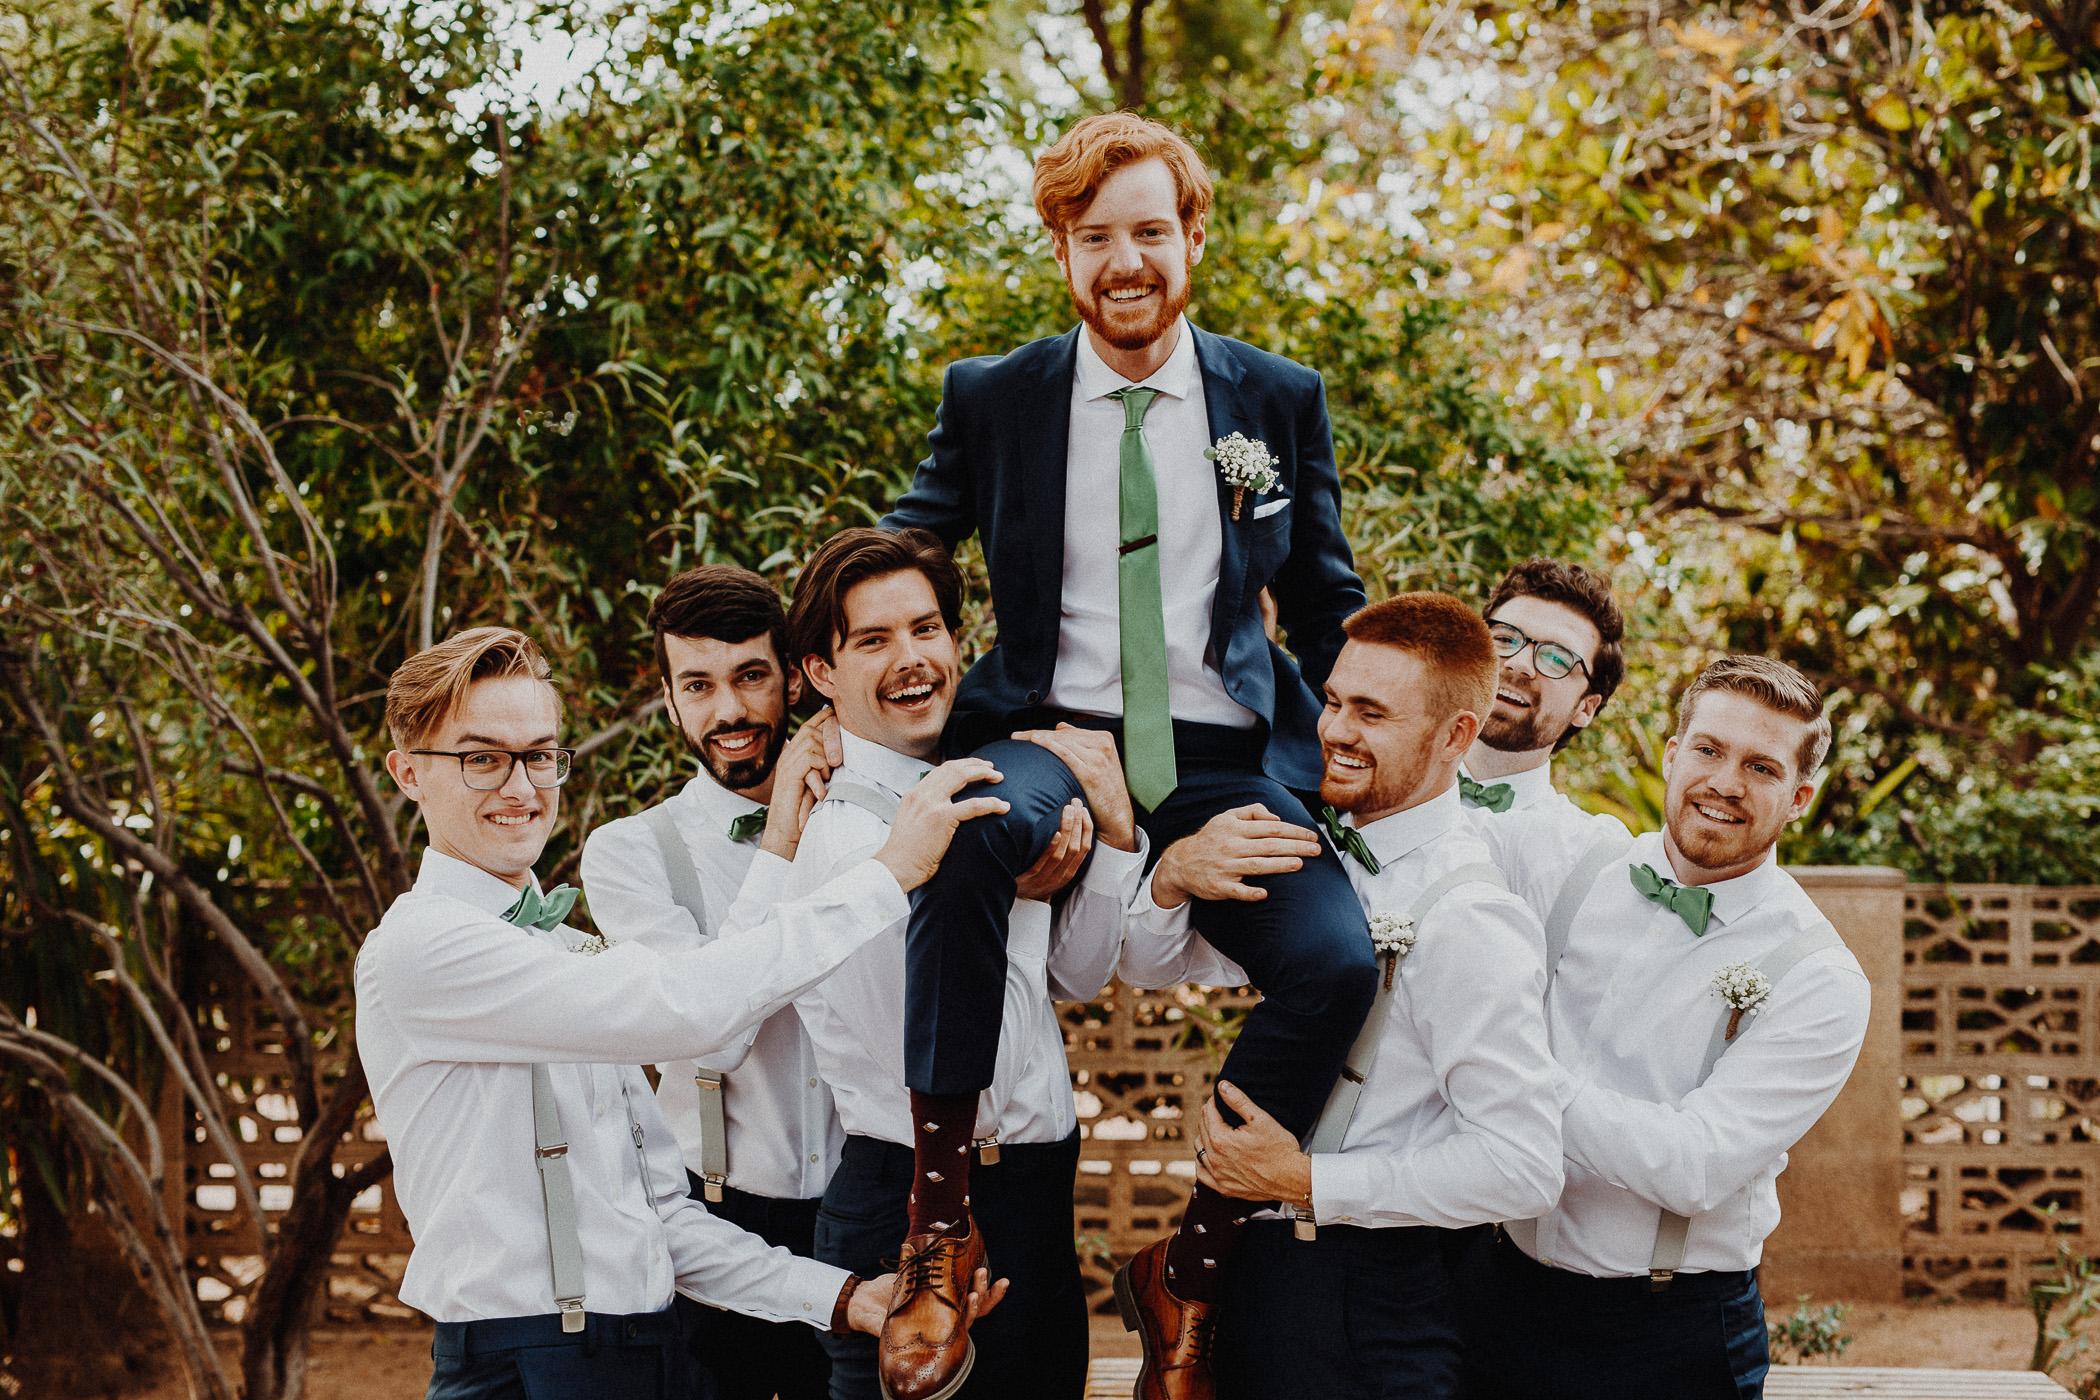 181104-Luxium-Weddings-Arizona-@matt__Le-Brandon-Kariana-Phoenix-Valley-Garden-Center-1038.jpg